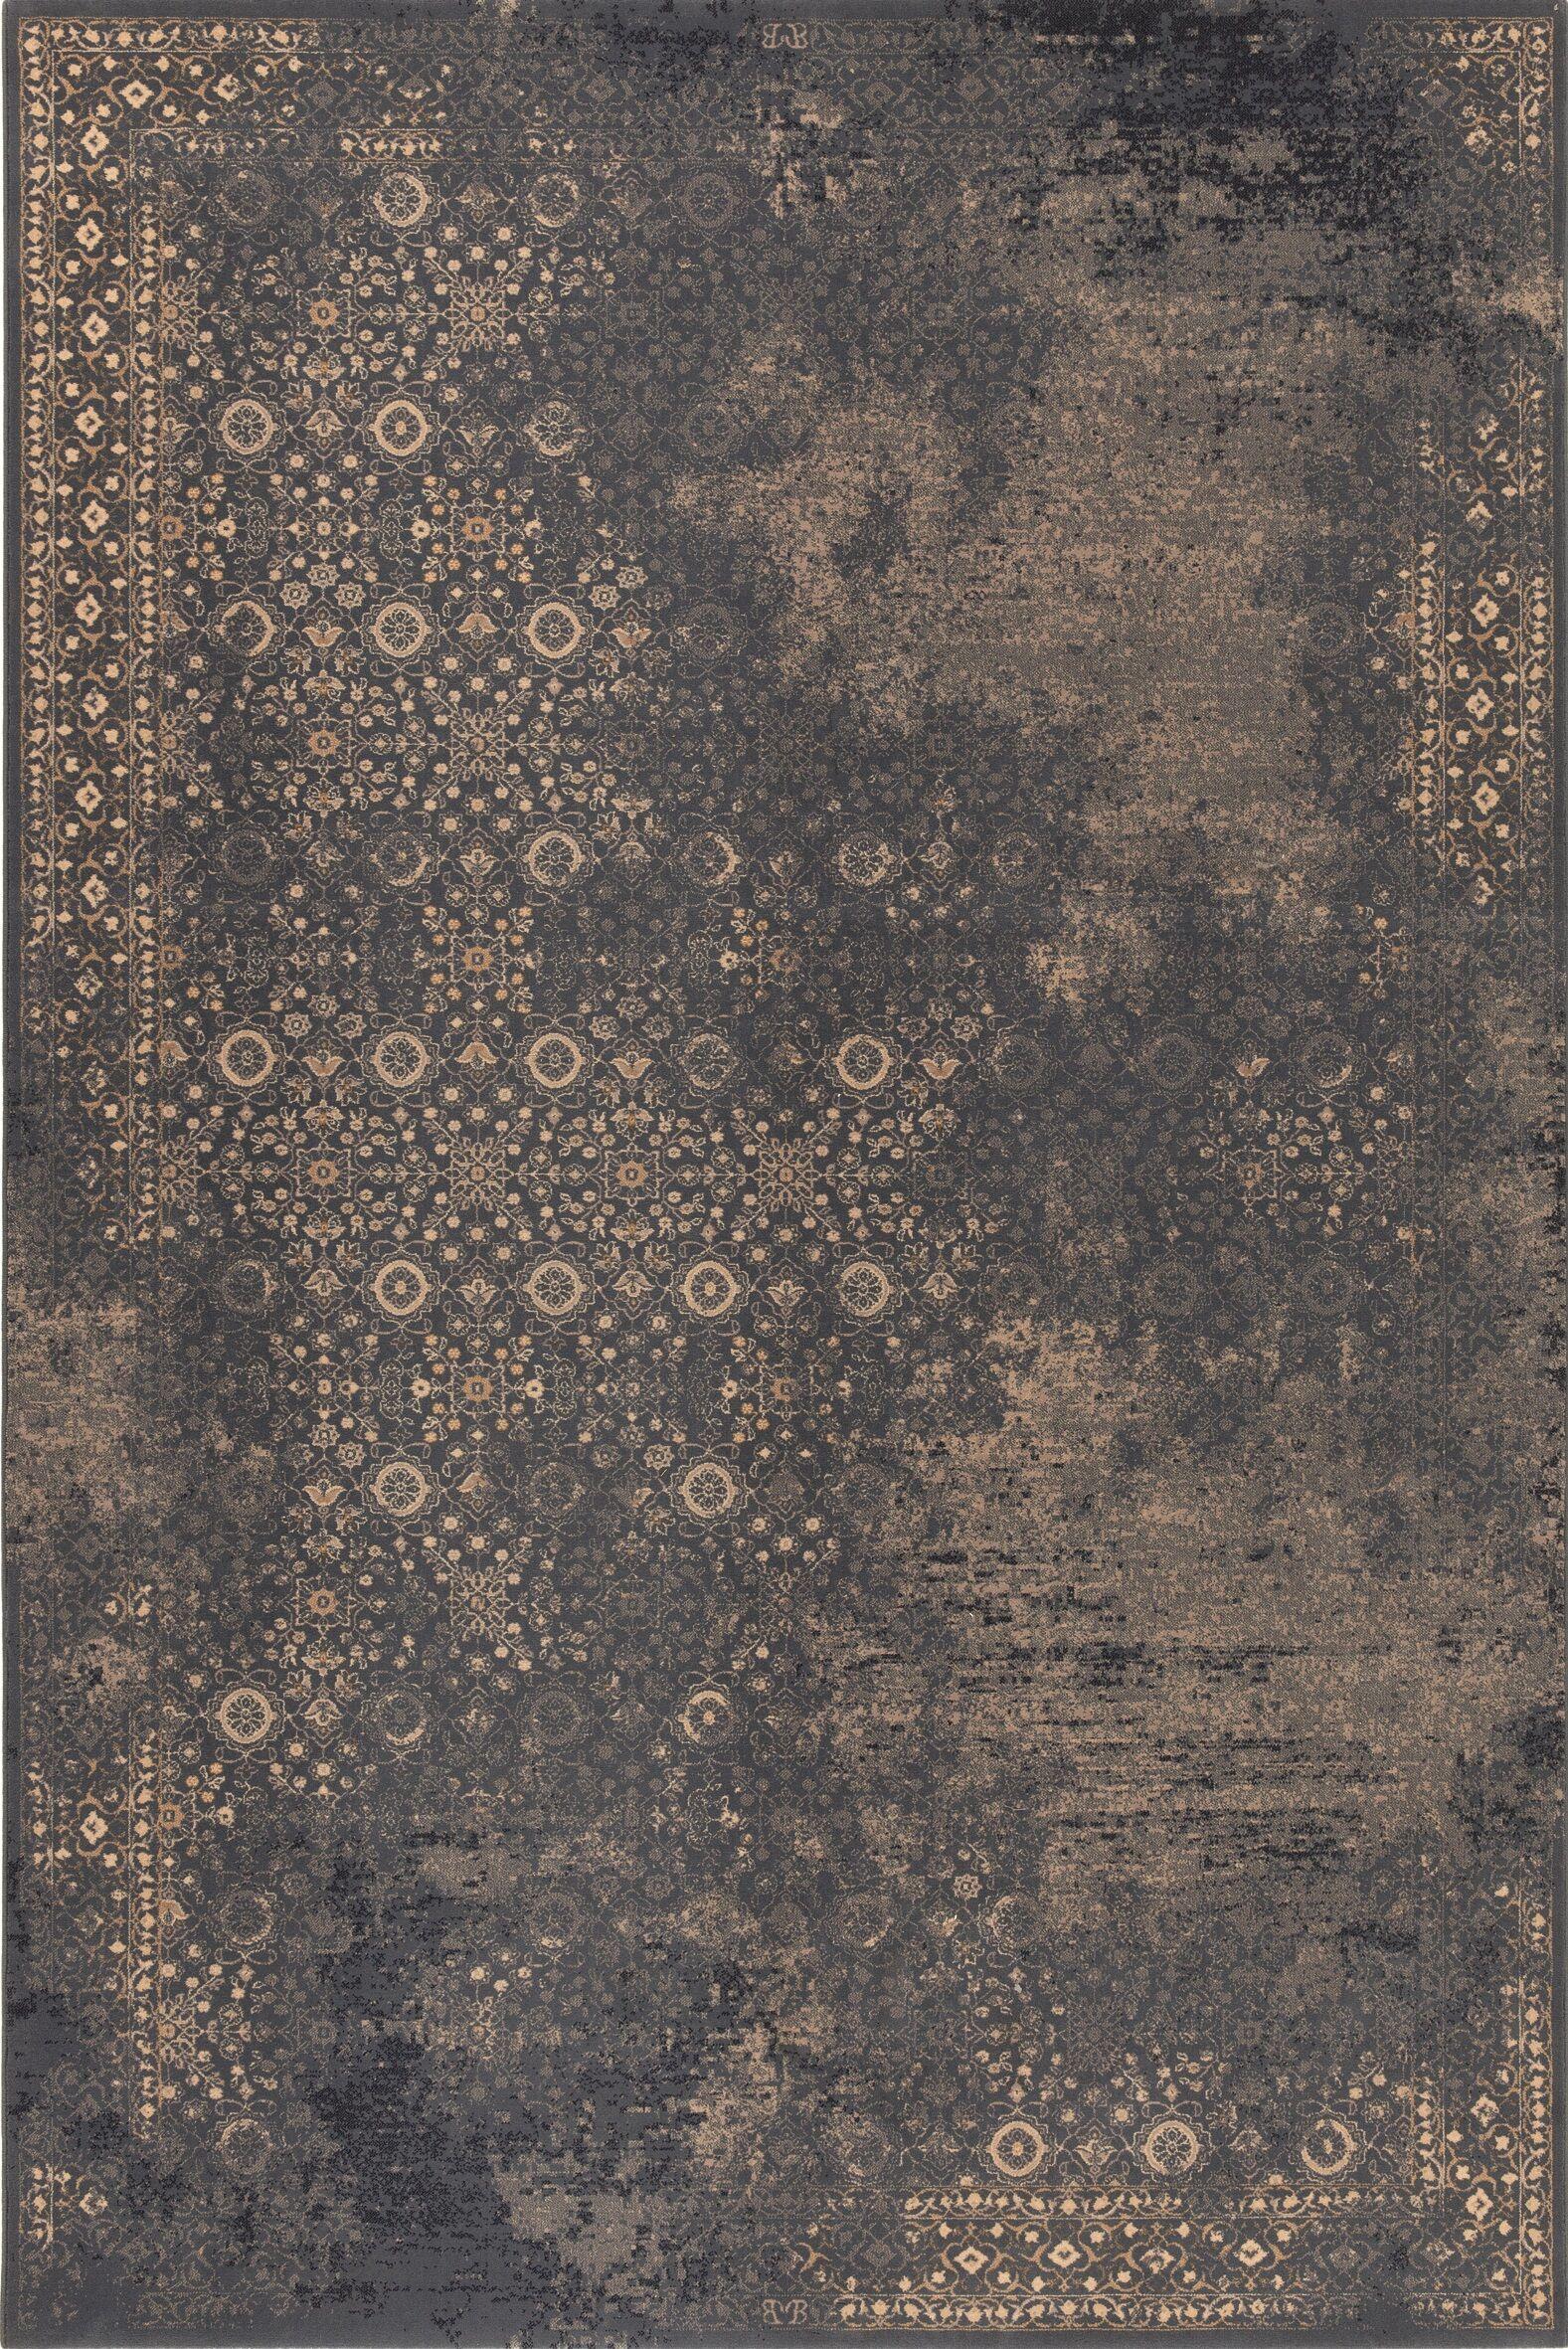 Covington Wool Brown Area Rug Rug Size: Rectangle 5'3